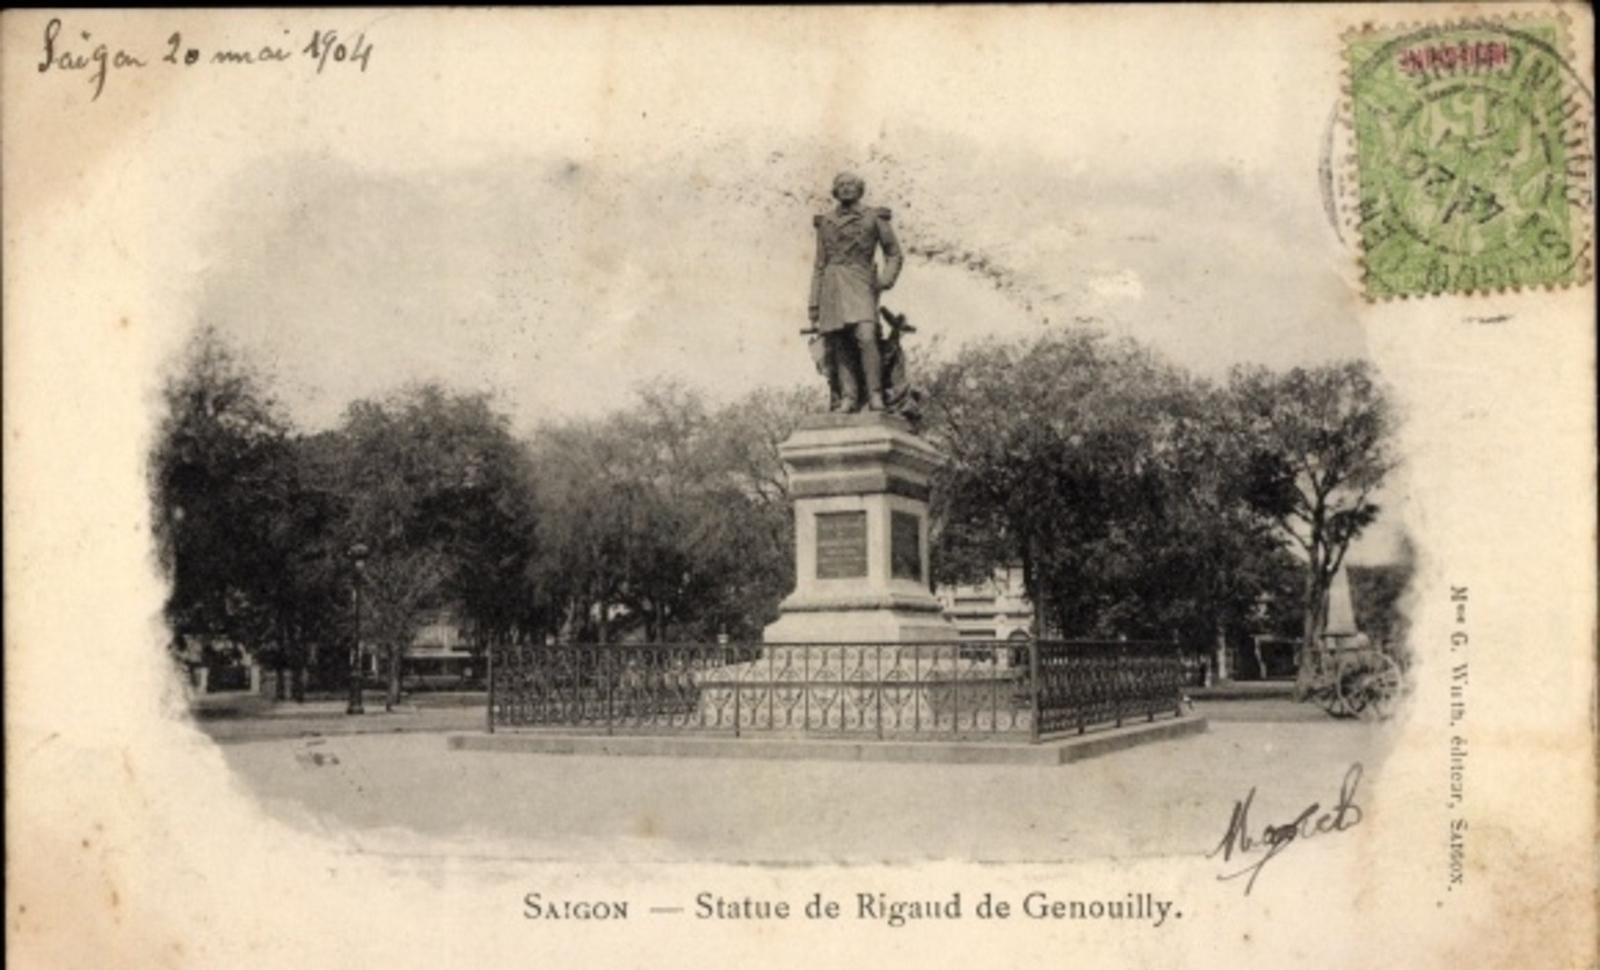 Hô Chi Minh-Ville -  Cp Saigon Cochinchine Vietnam, Statue de Rigaud de Genouilly